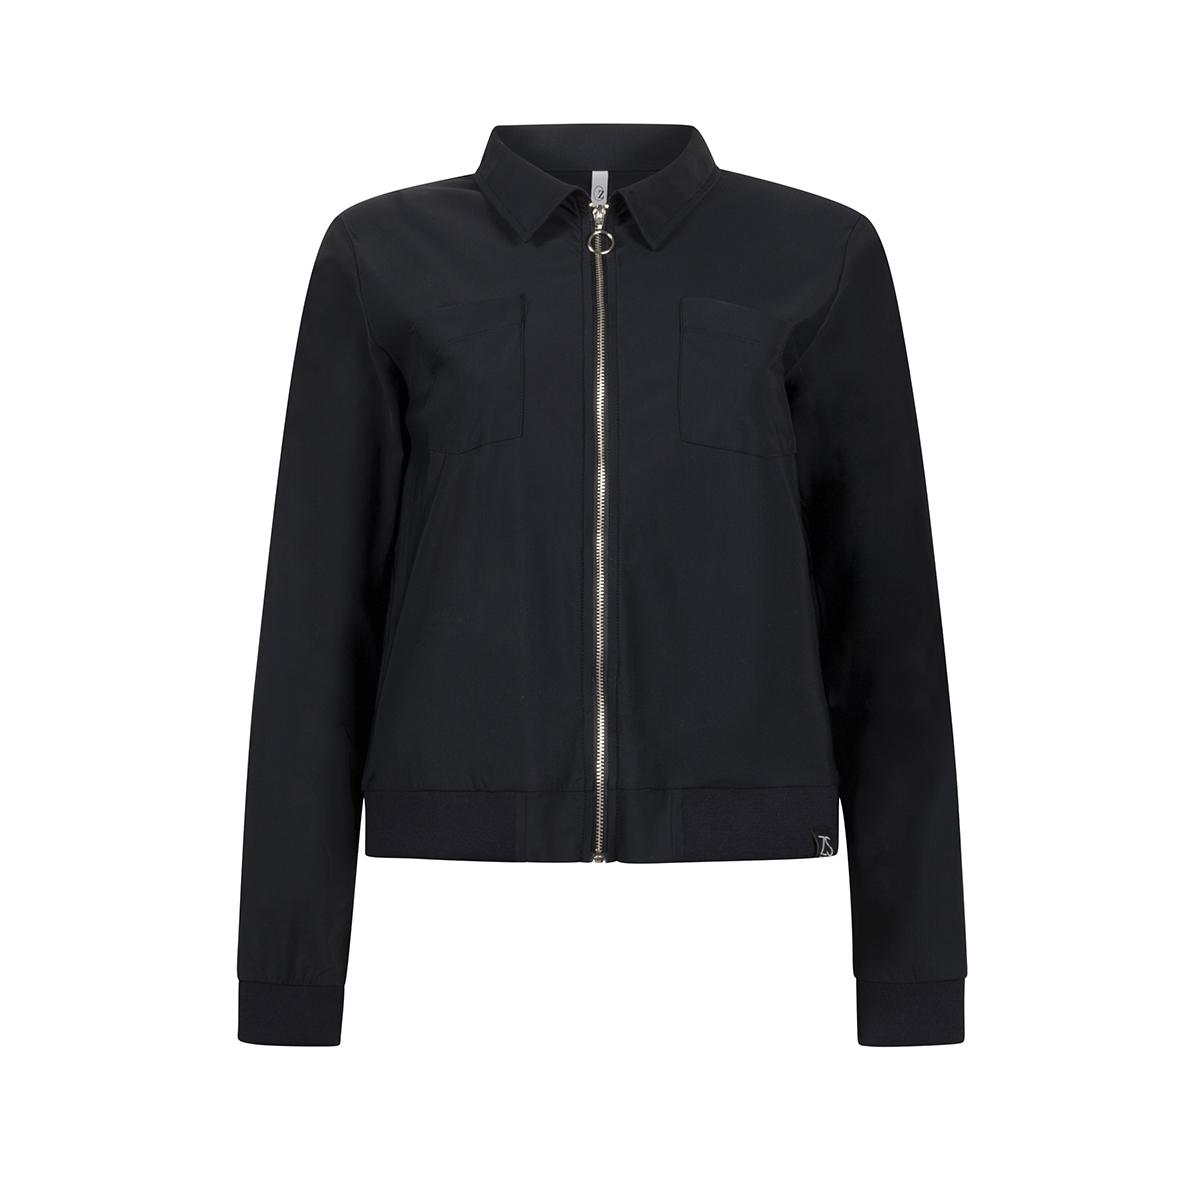 bianca travel jacket 202 zoso jas navy